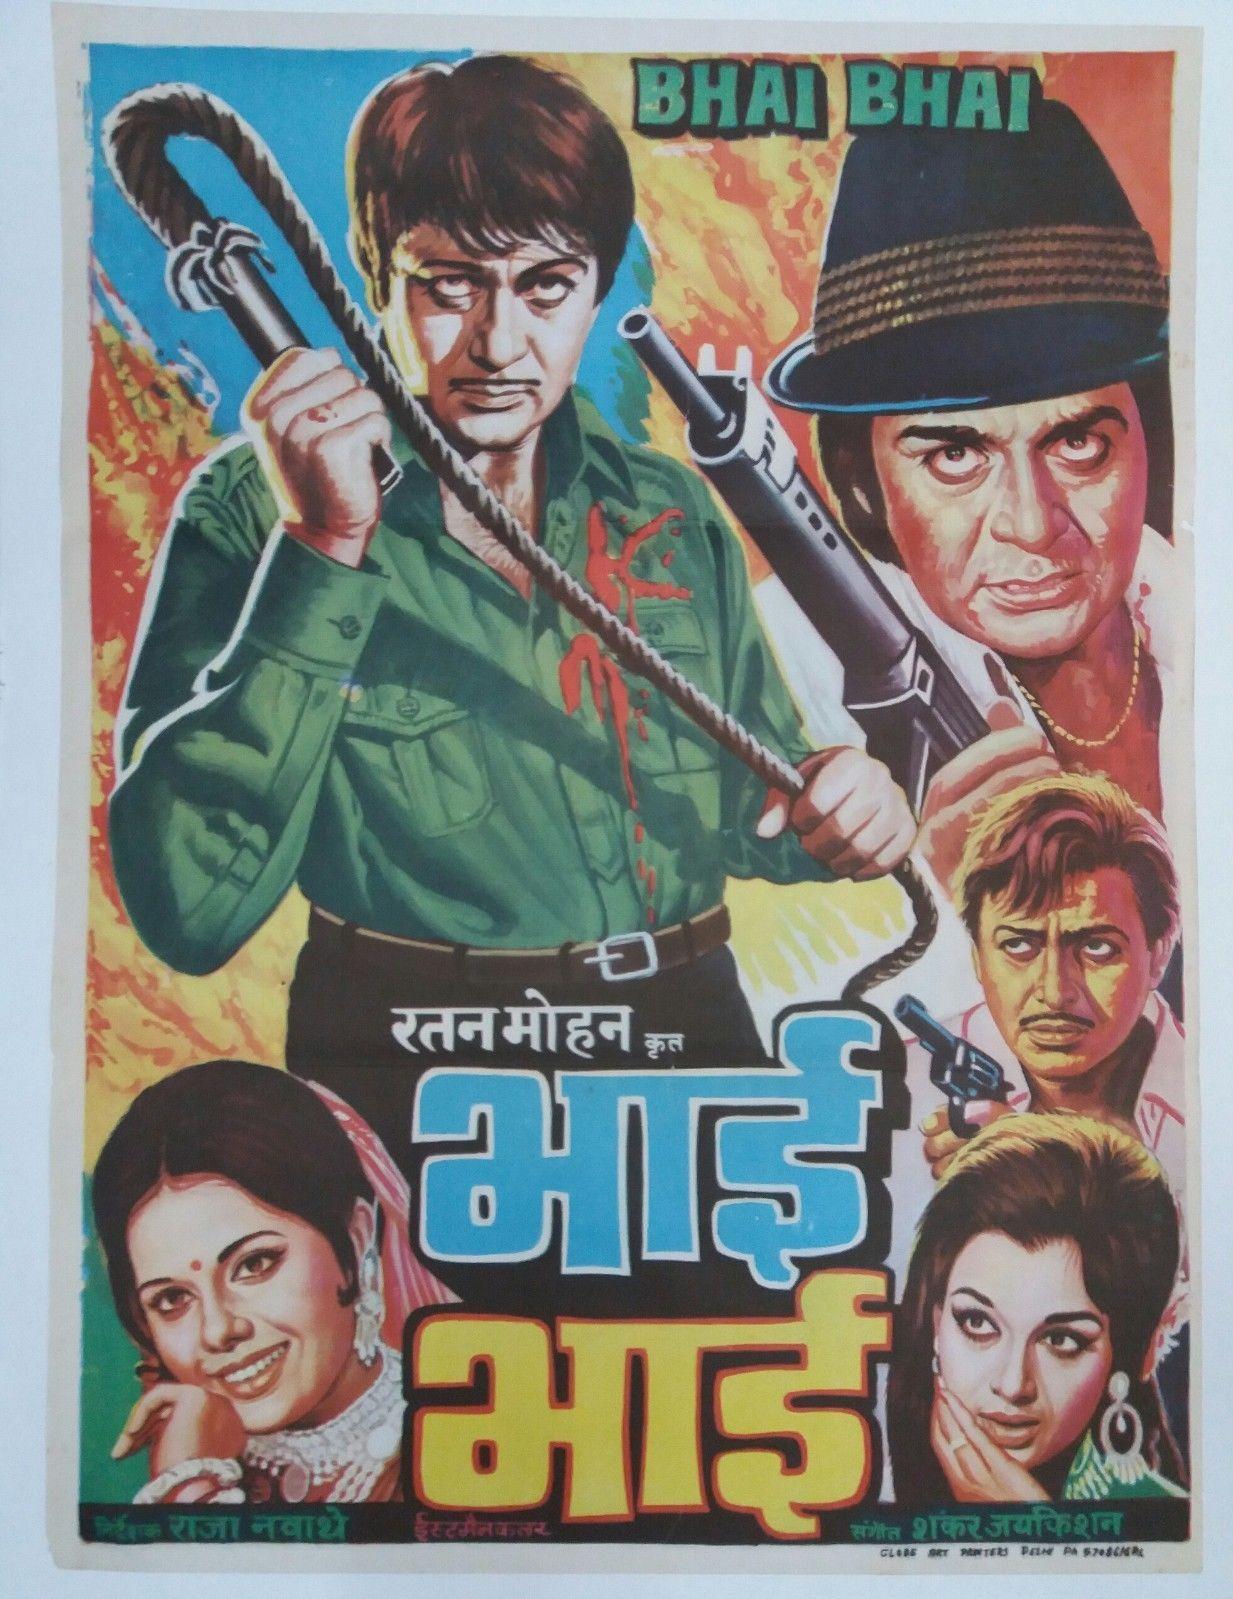 Indian Vintage Bollywood Movie Poster Bhai Bhai Sunil Dutt Mumtaz Asha Parekh Entertainment Memorabilia Movi Movie Posters Vintage Bollywood Indian Movies